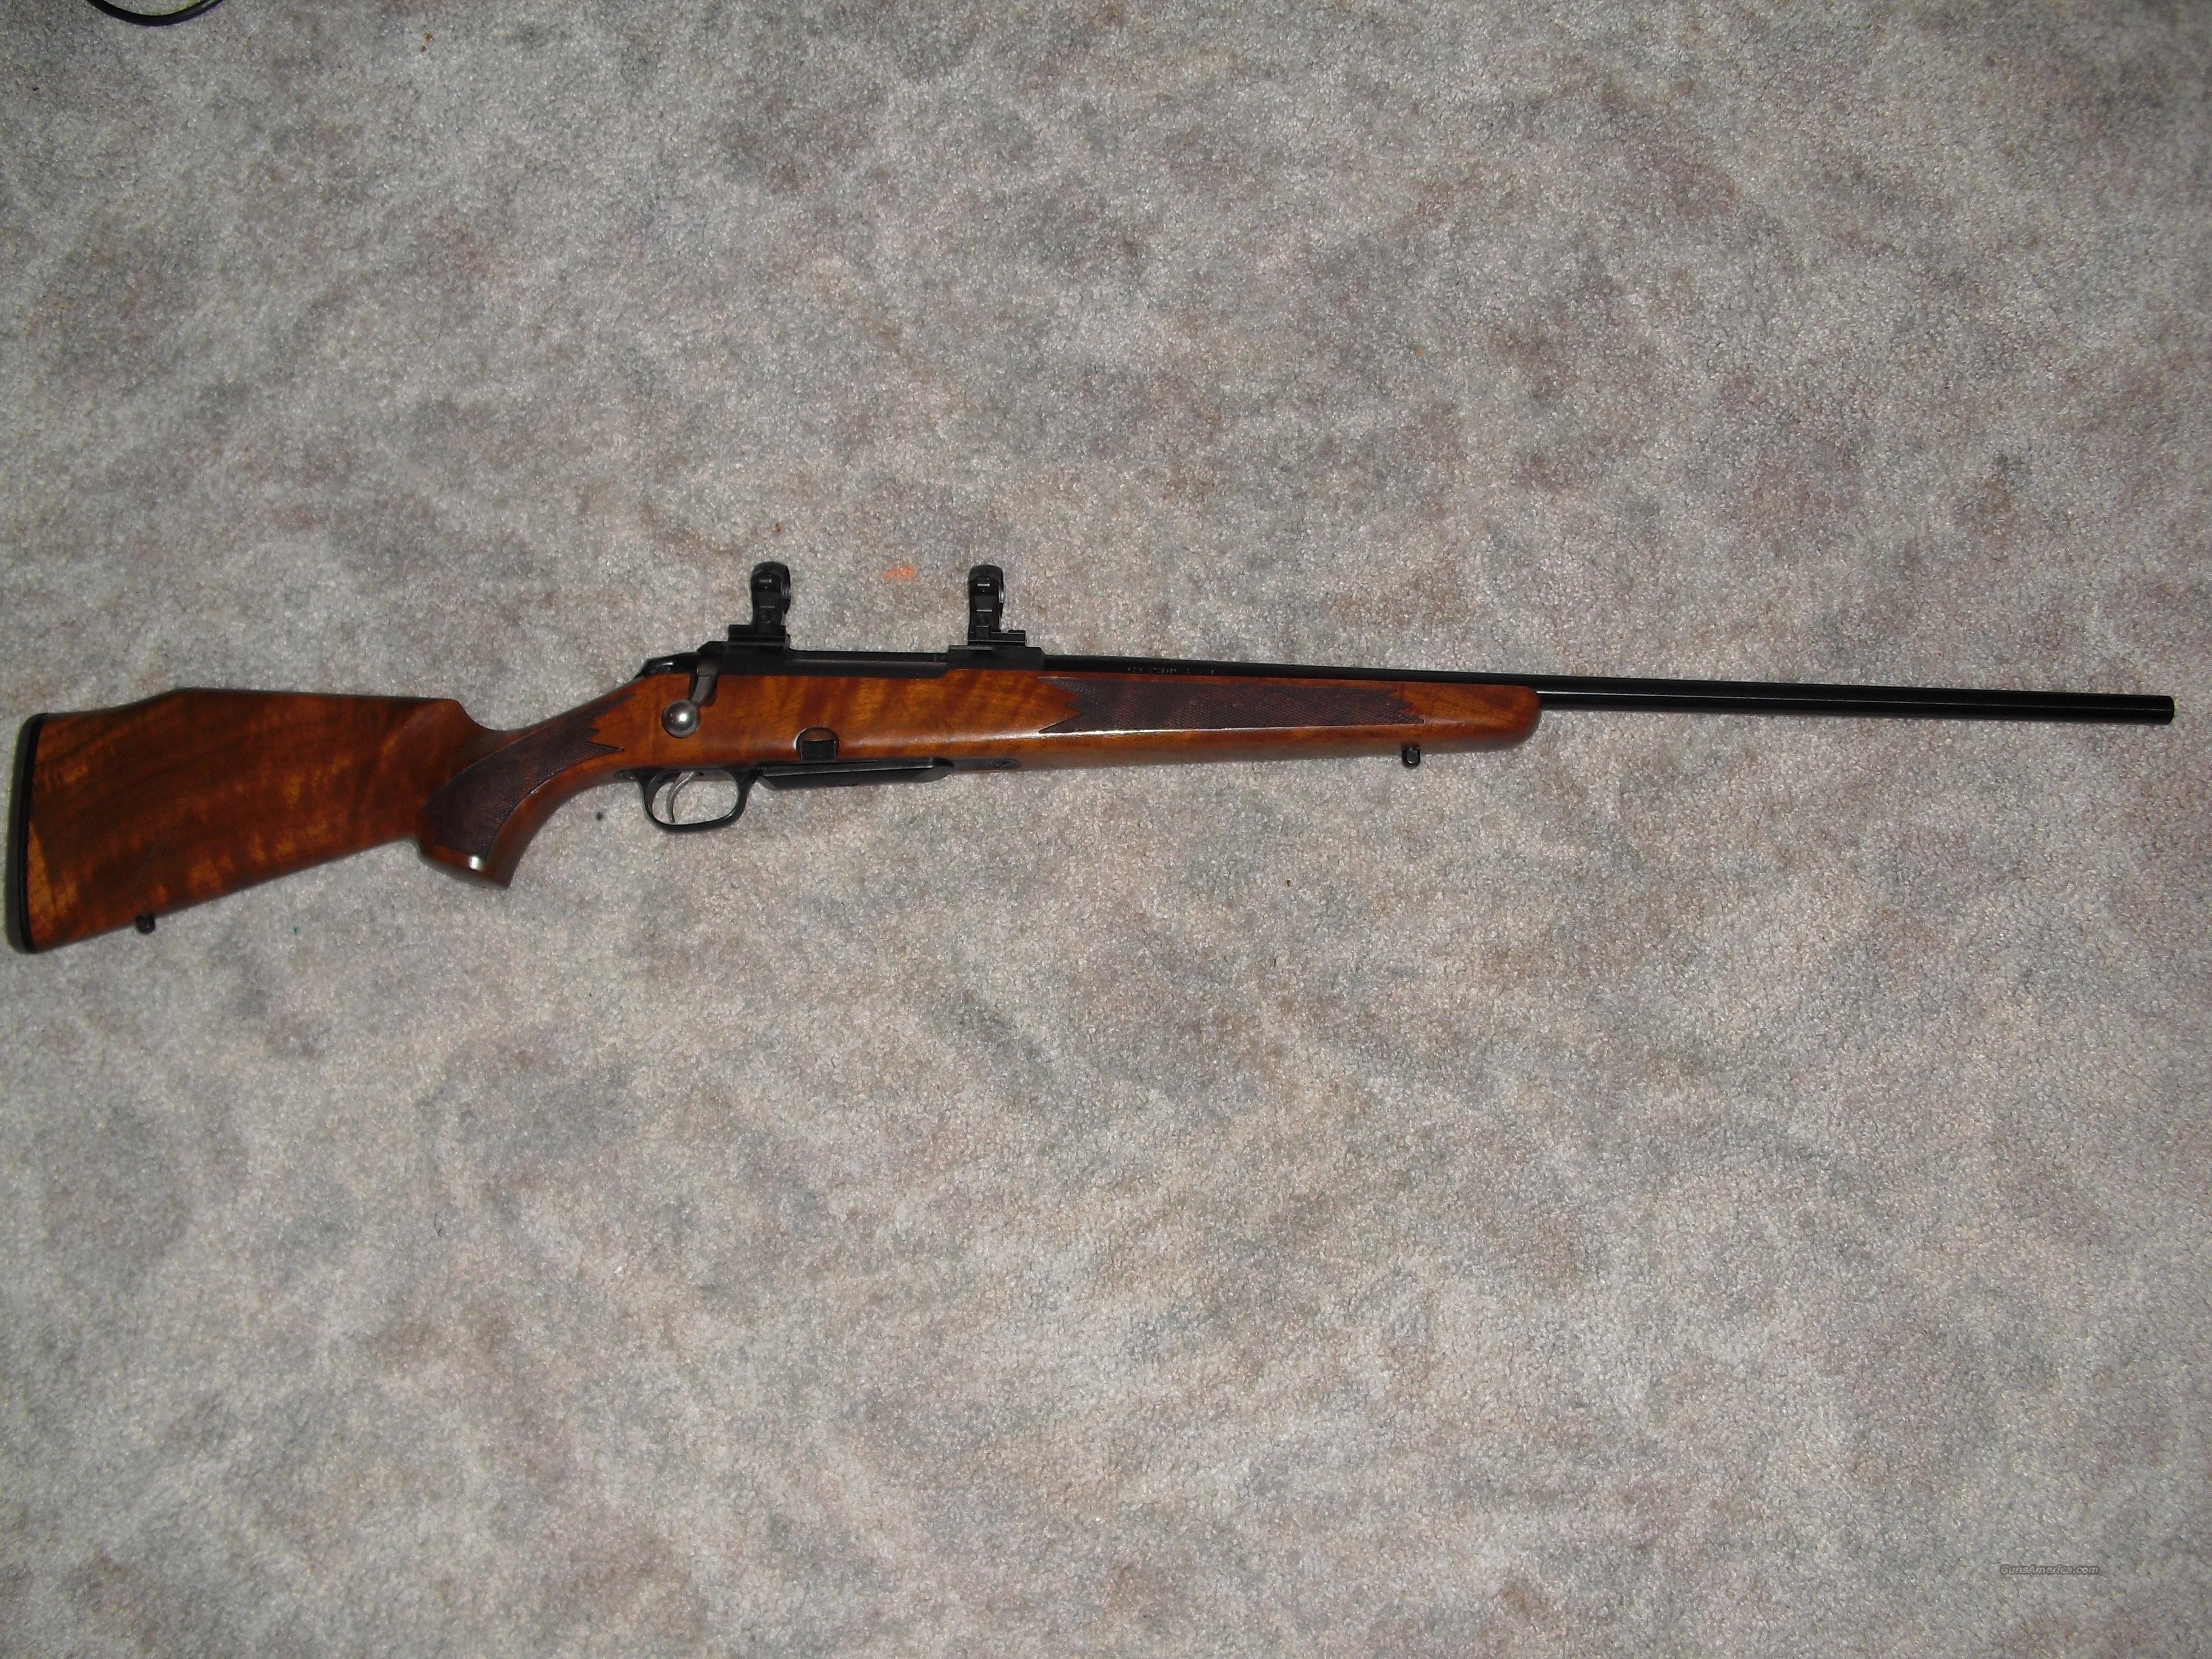 Tikka M695 .338 Win Rocky Mtn. Elk Foundation RARE  Guns > Rifles > Tikka Rifles > Other